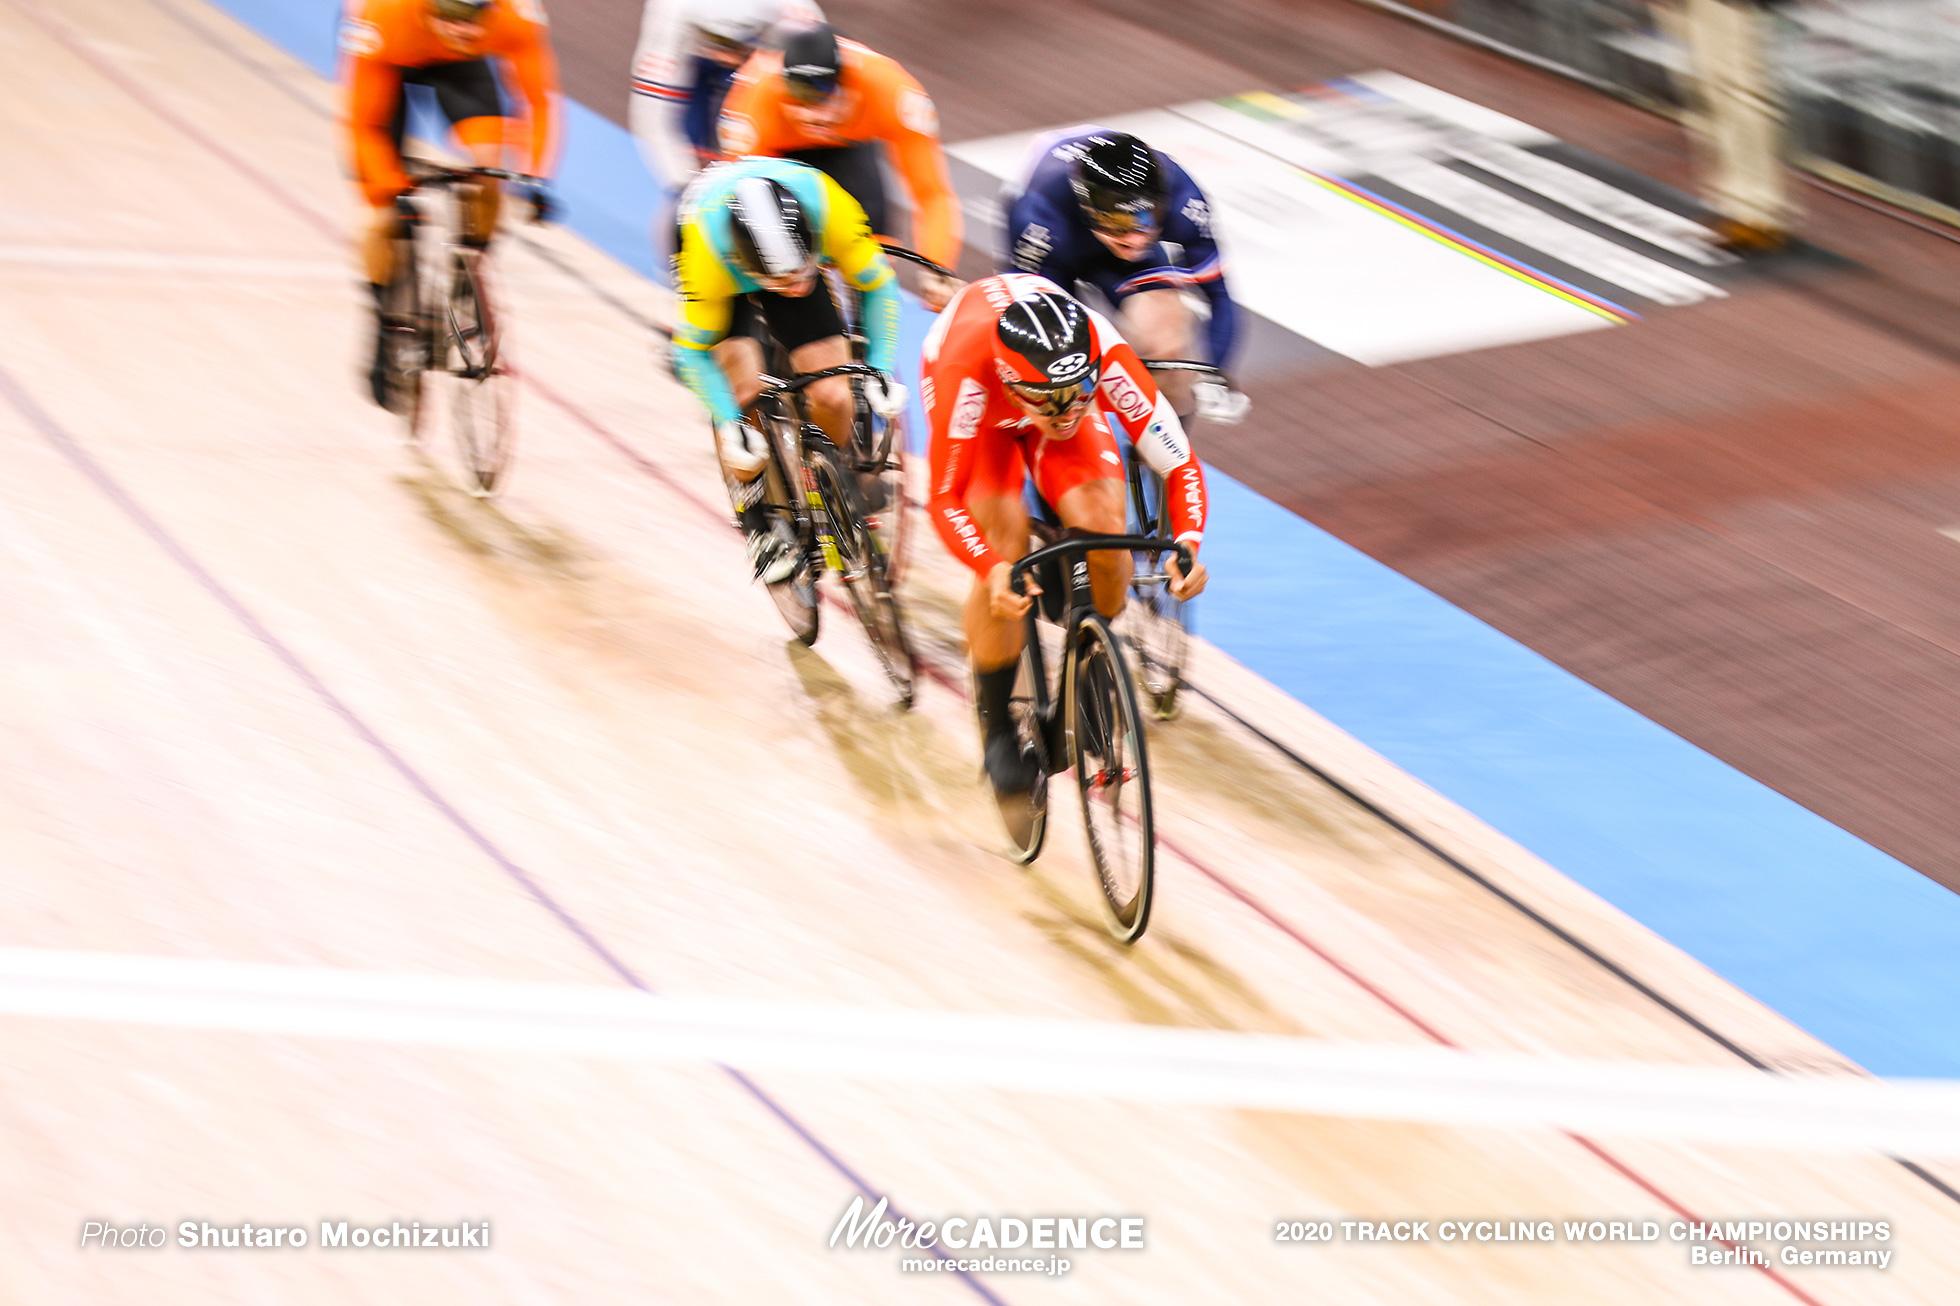 Semi Final / Men's Keirin / 2020 Track Cycling World Championships, Wakimoto Yuta 脇本雄太, Sergey Ponomaryov セルゲイ・ポノマリョフ, Sebastien Vigier セバスチャン・ビジエ